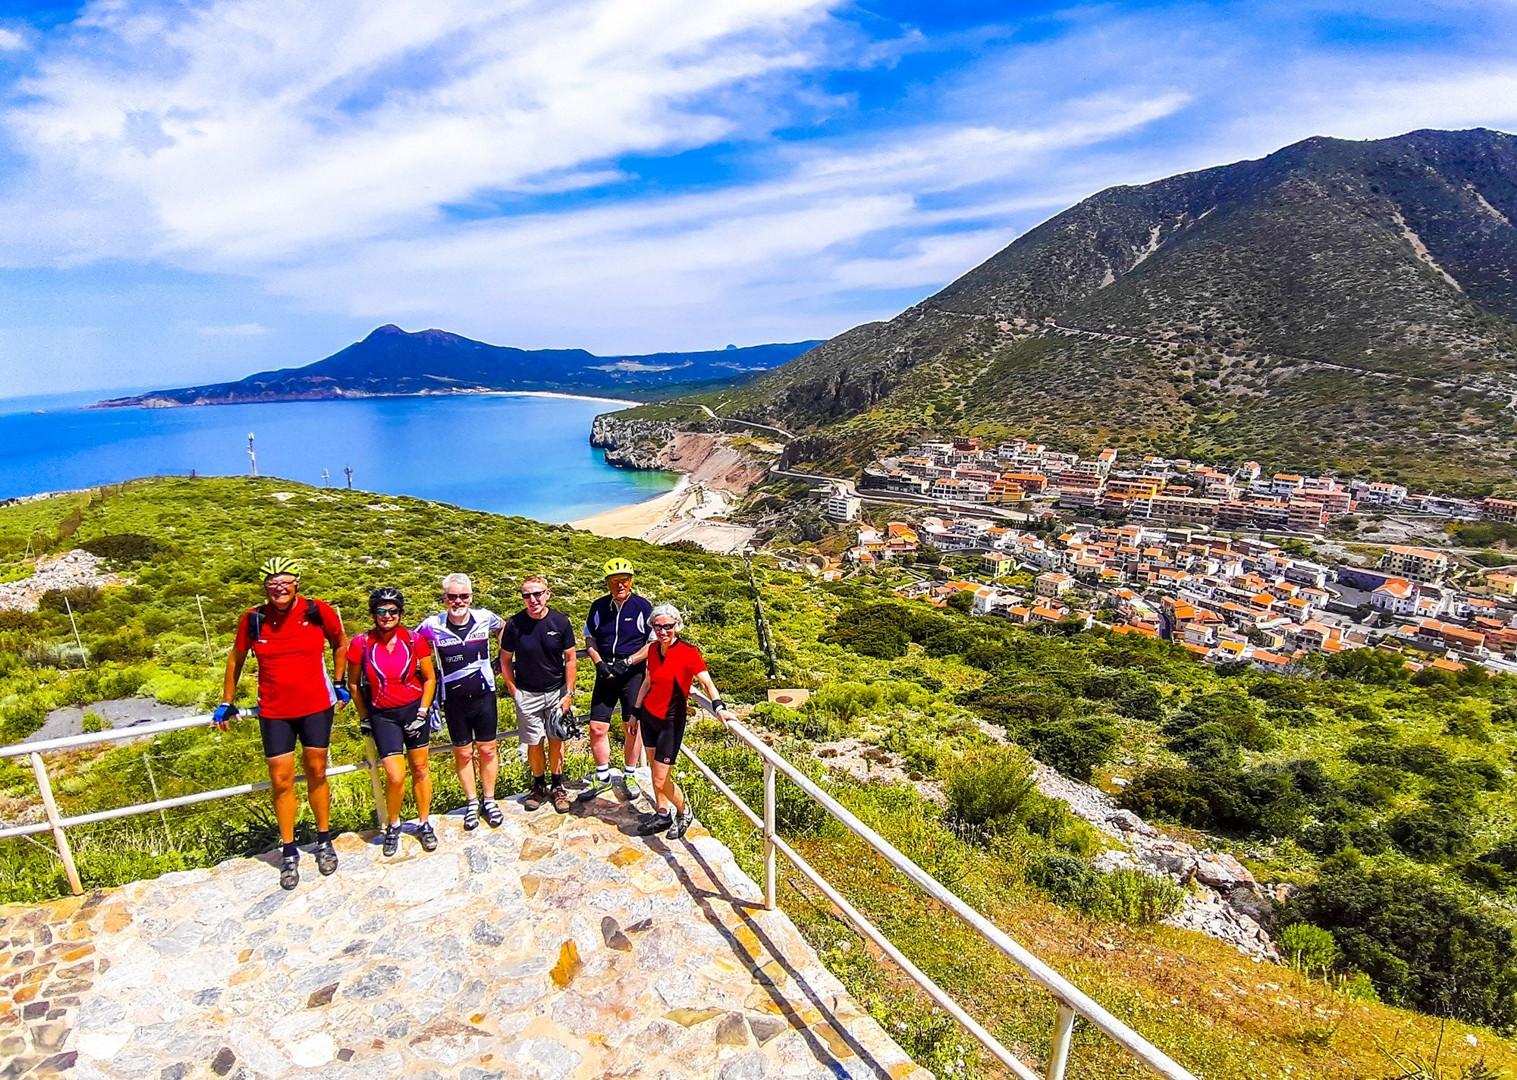 celebration-saddle-skedaddle-holiday-in-sardinia-leisure-cycling.jpg - Italy - Sardinia - Island Flavours - Guided Leisure Cycling Holiday - Italia Leisure and Family Cycling